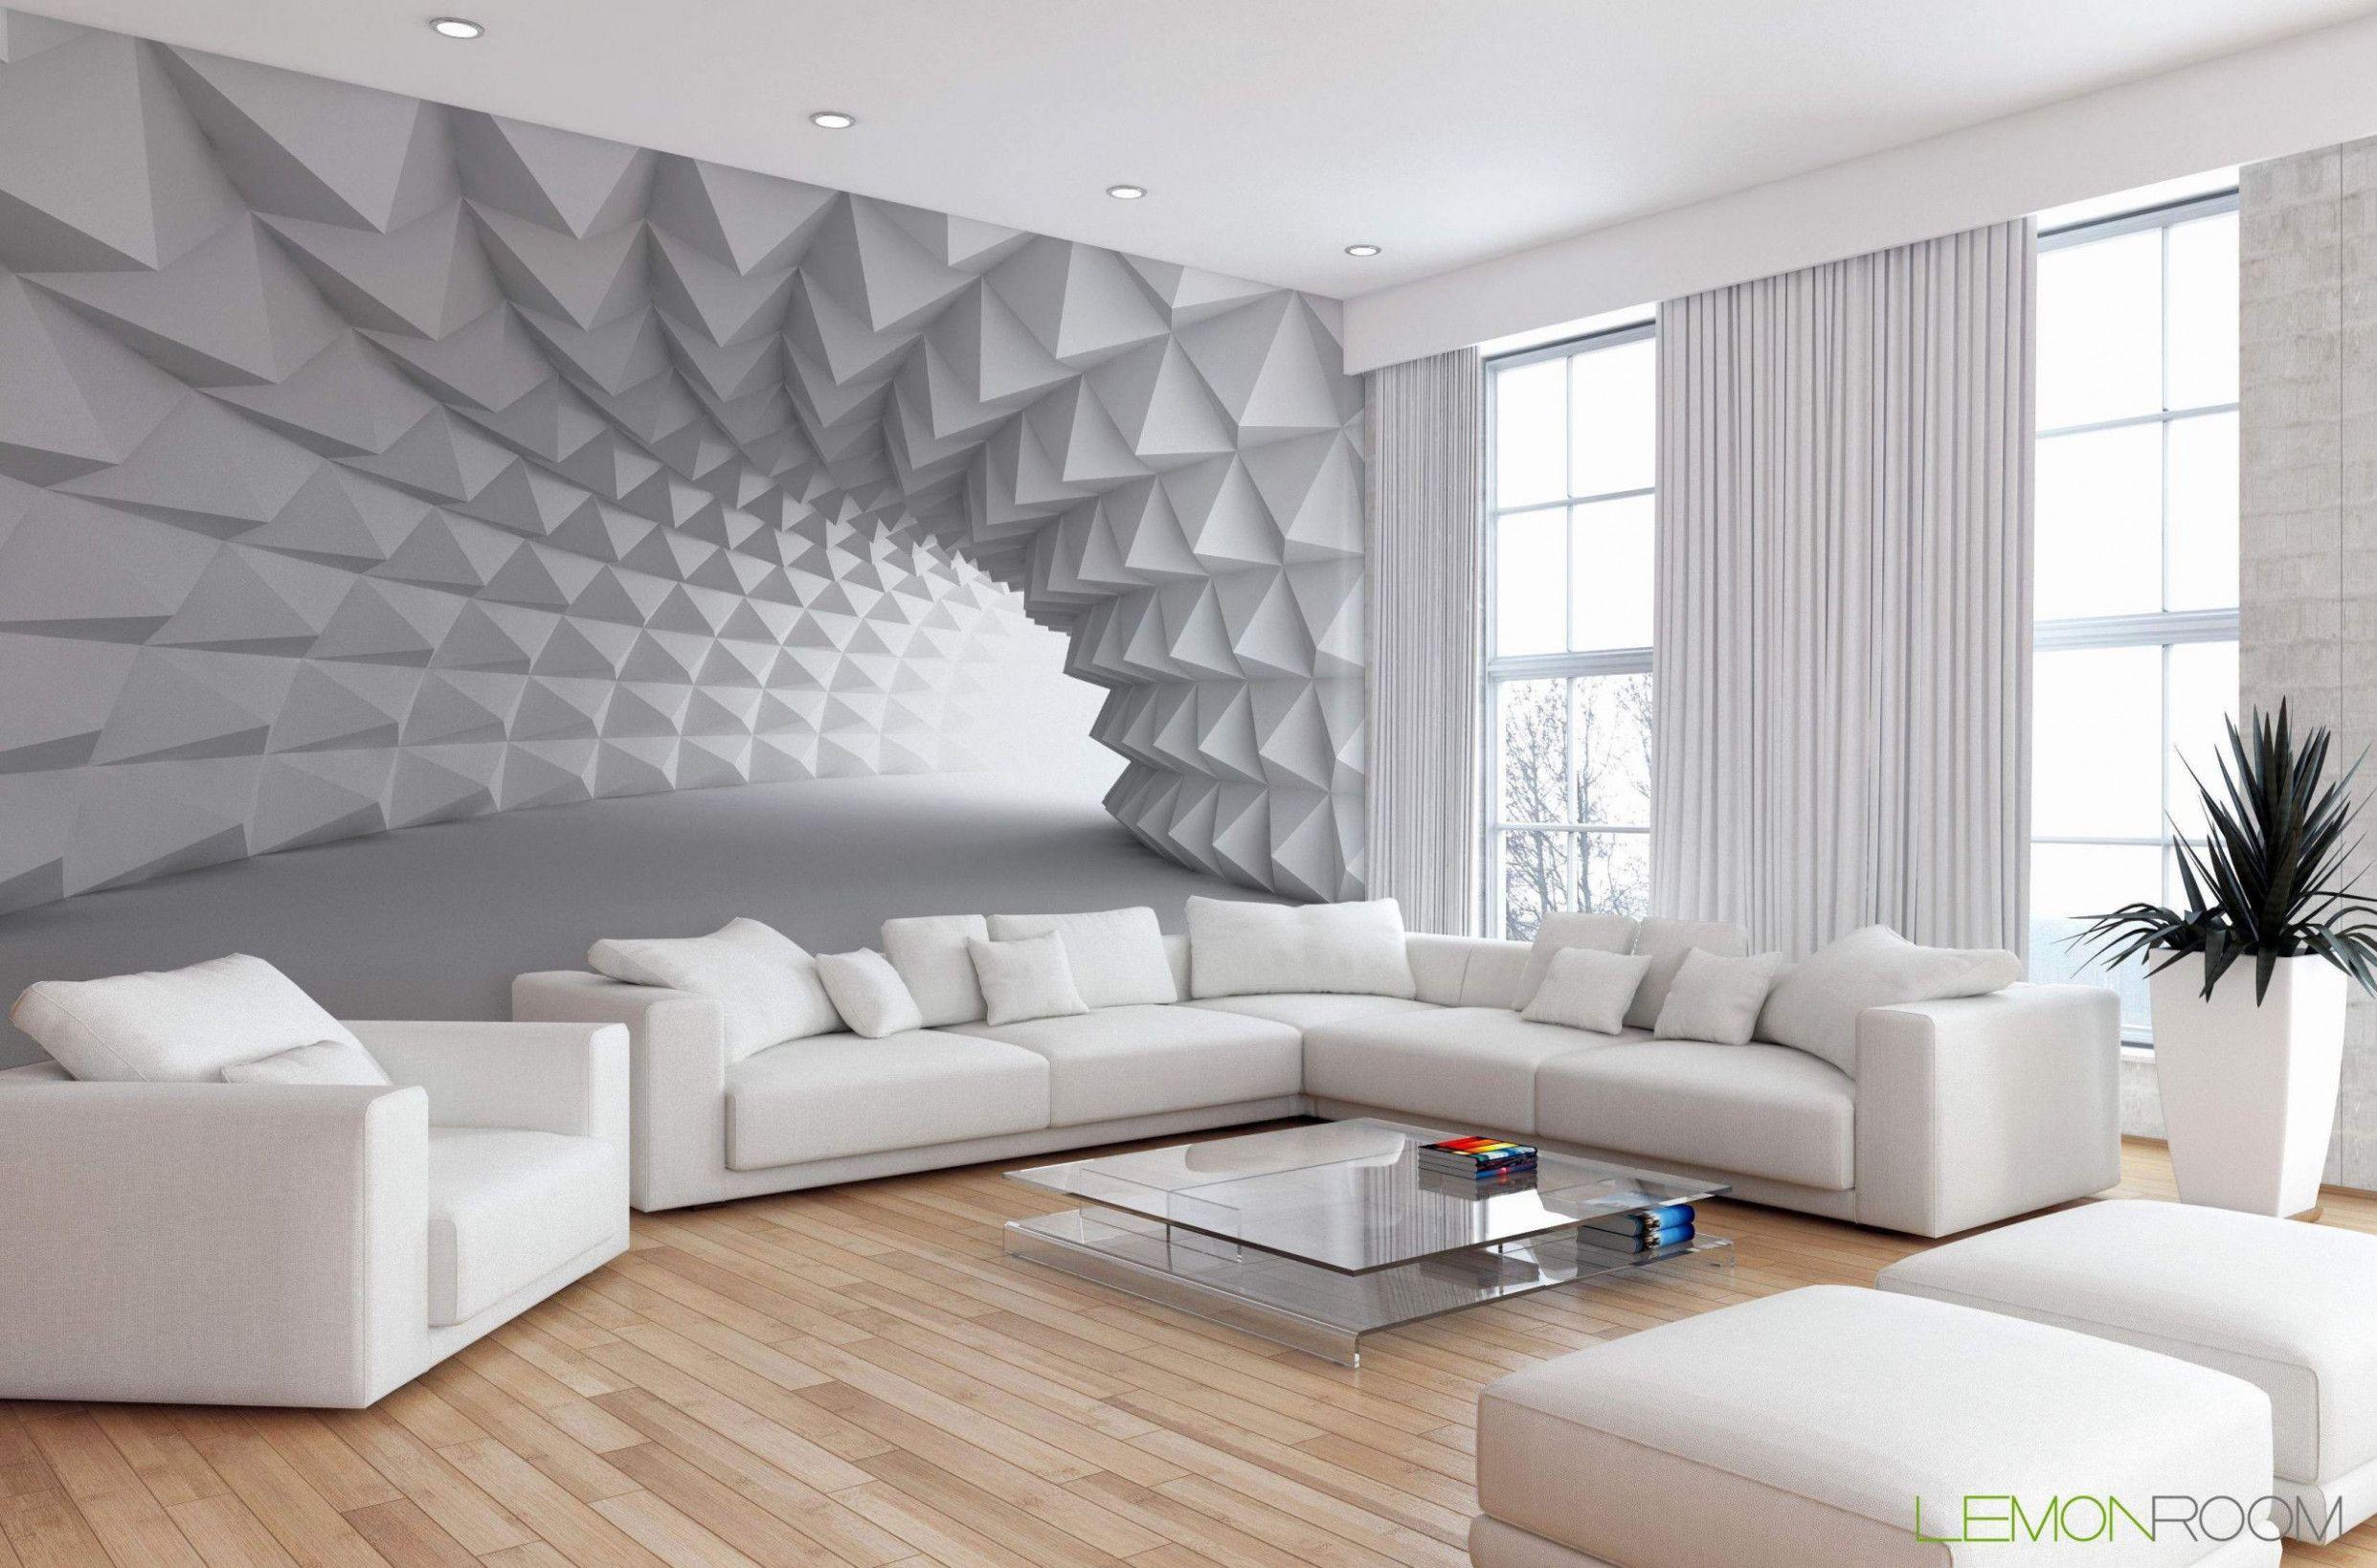 8 Tapeten Für Wohnzimmer Ideen di 8  Dekorasi ruang keluarga